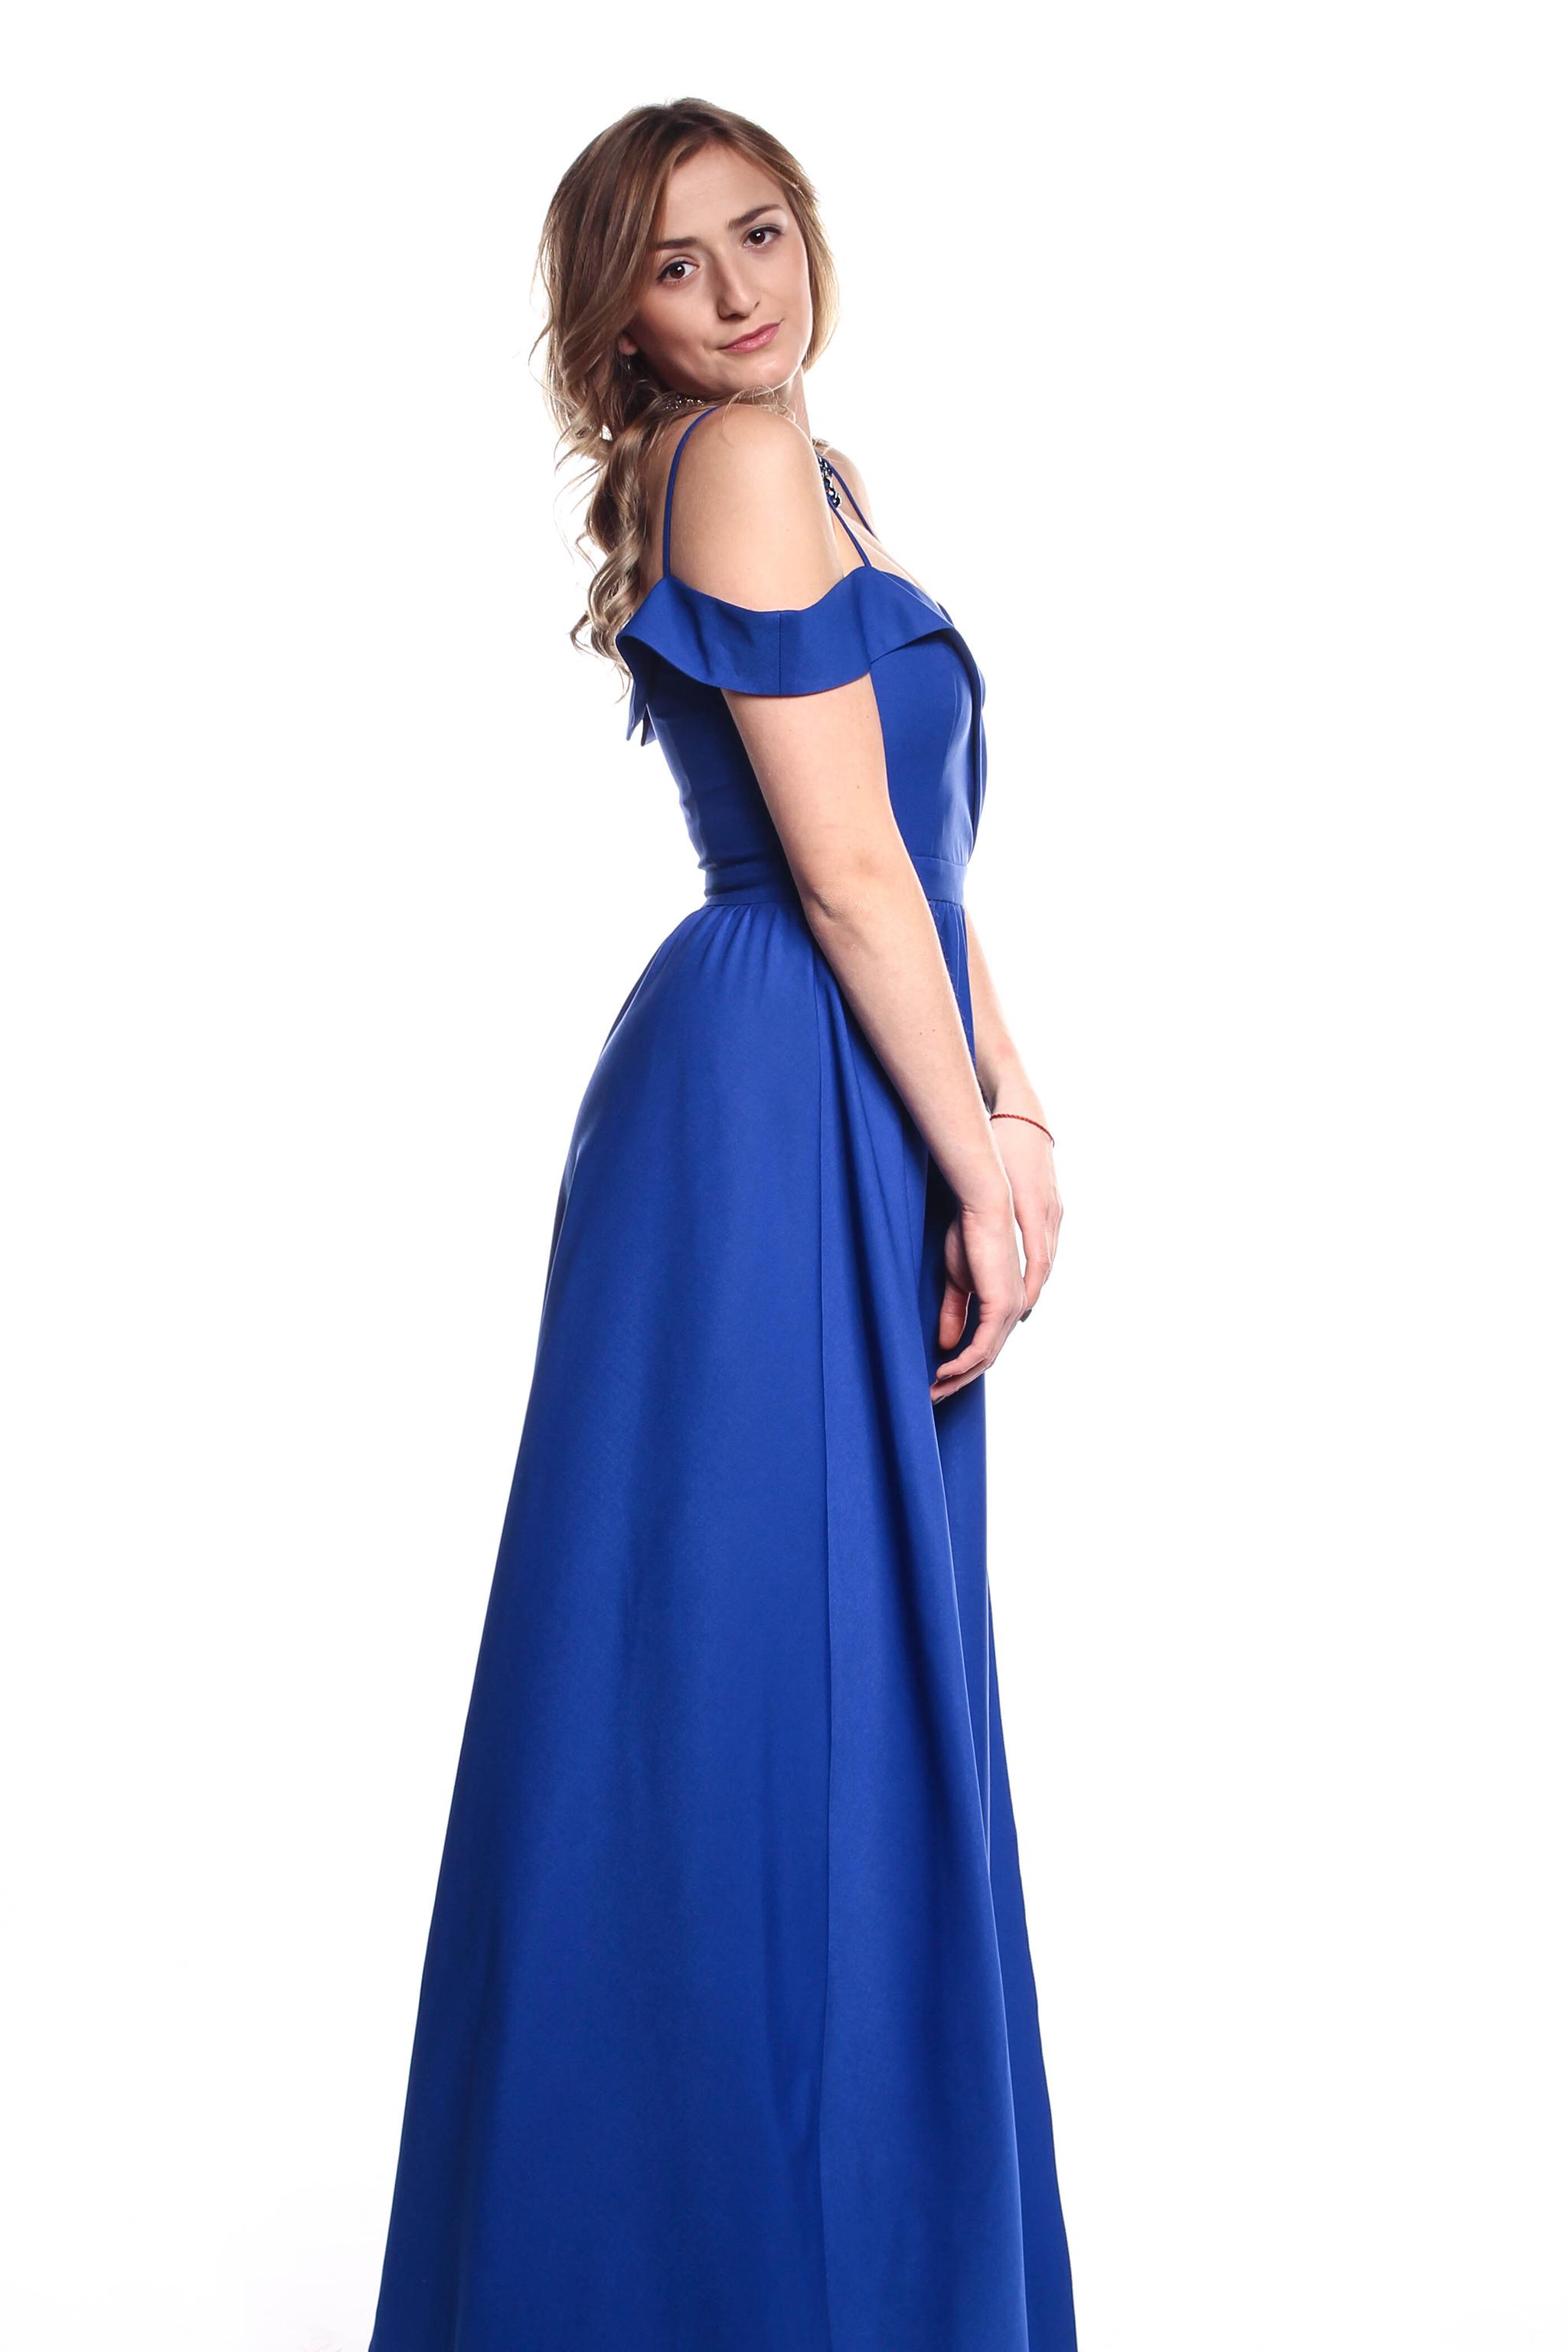 Obrázok 2 Modré plesové šaty - Shaty 638457210e0